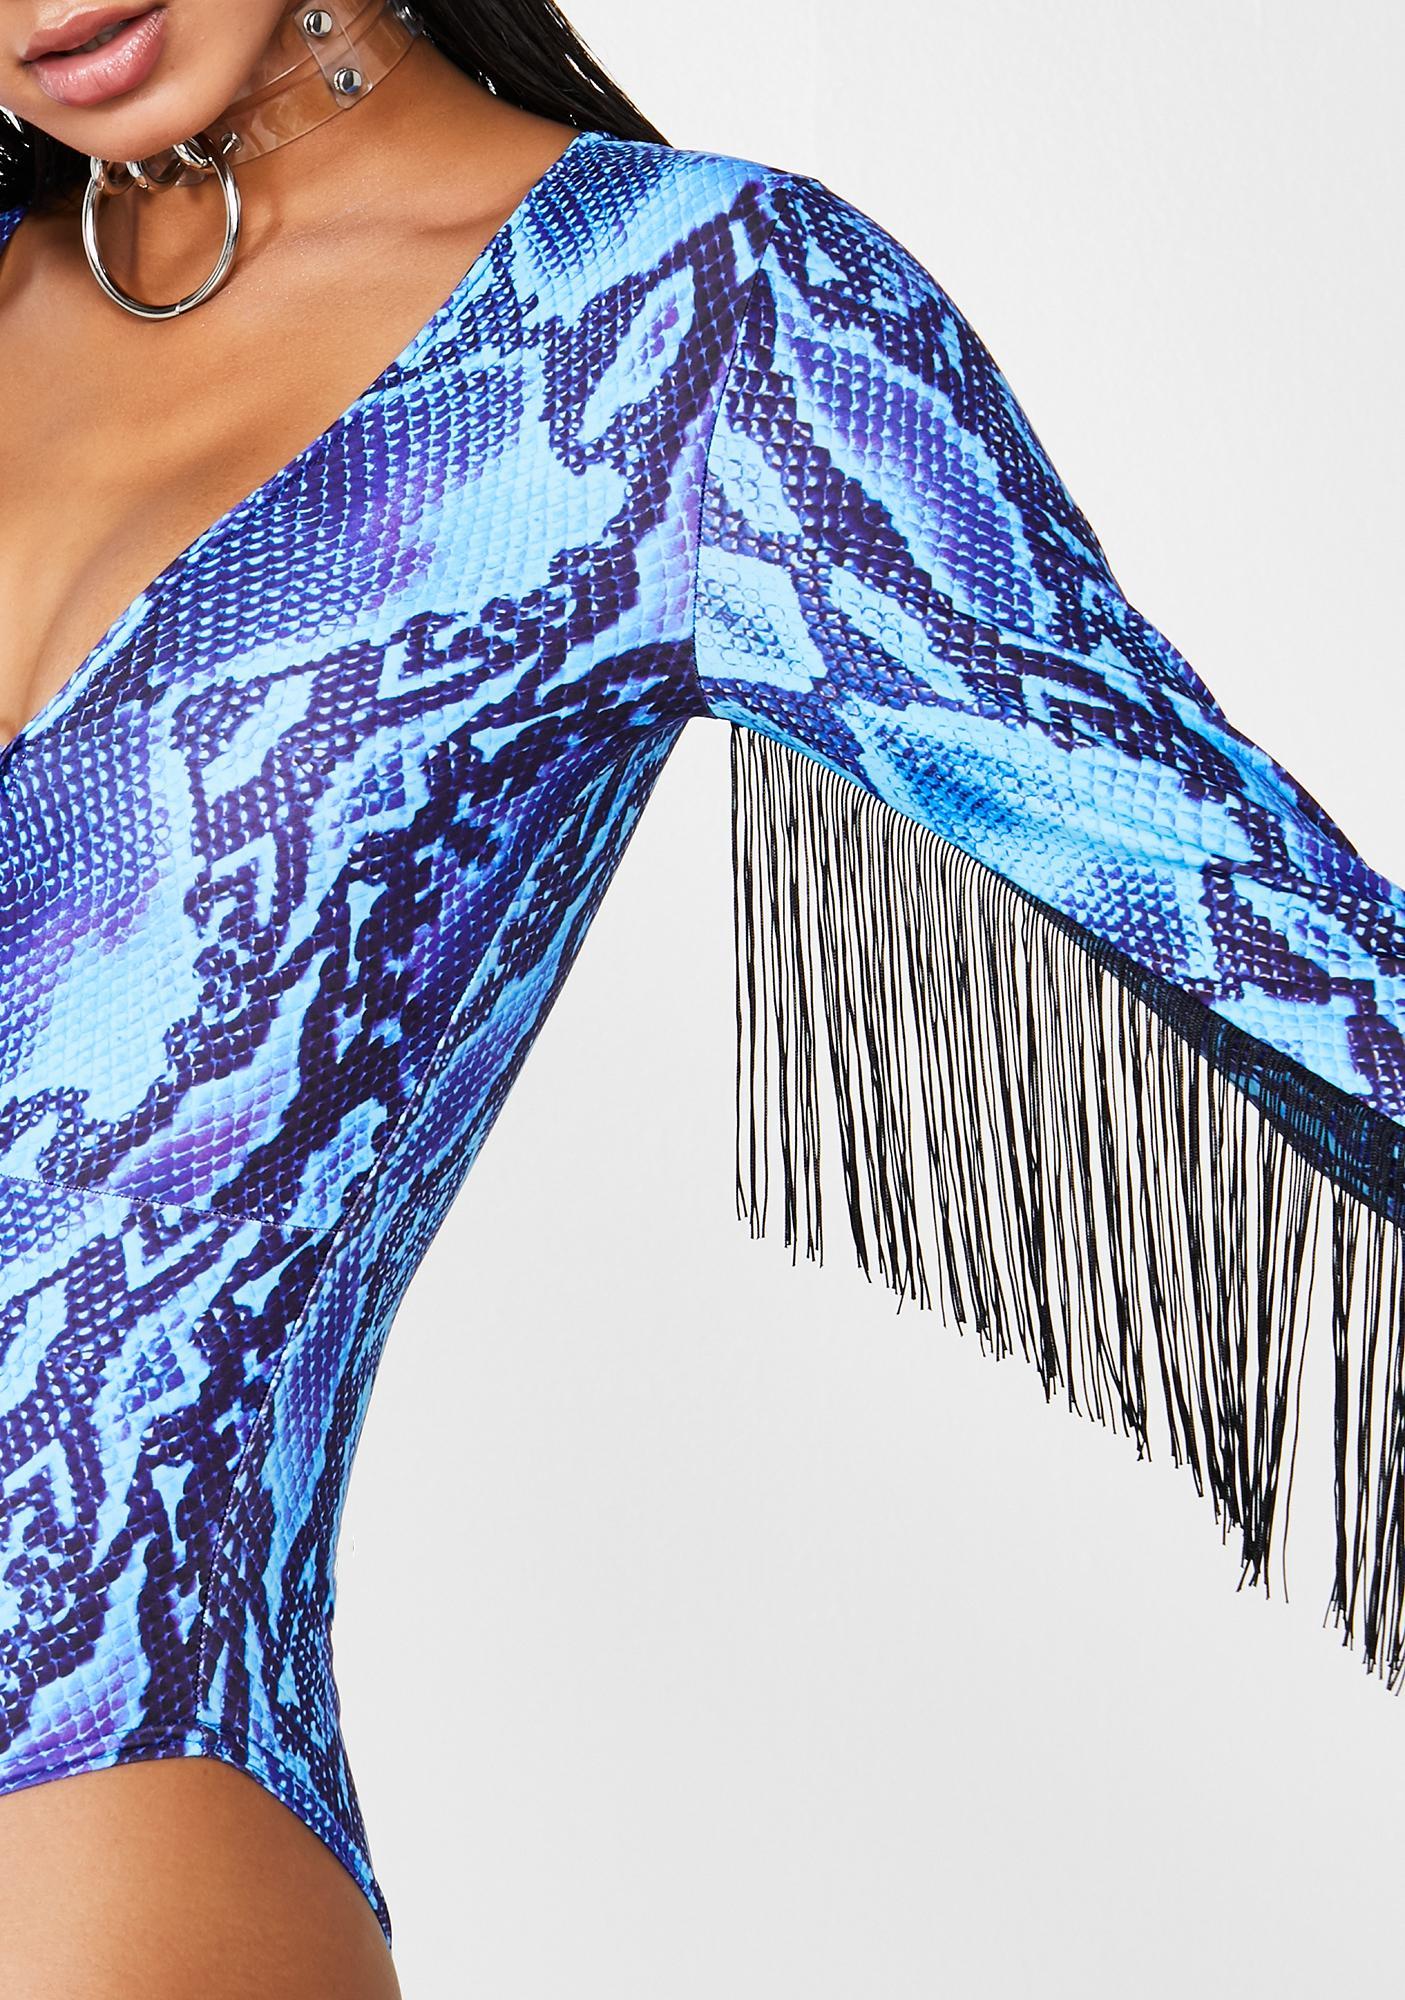 Get Crooked Blue Viper Plunge O-Ring Bodysuit